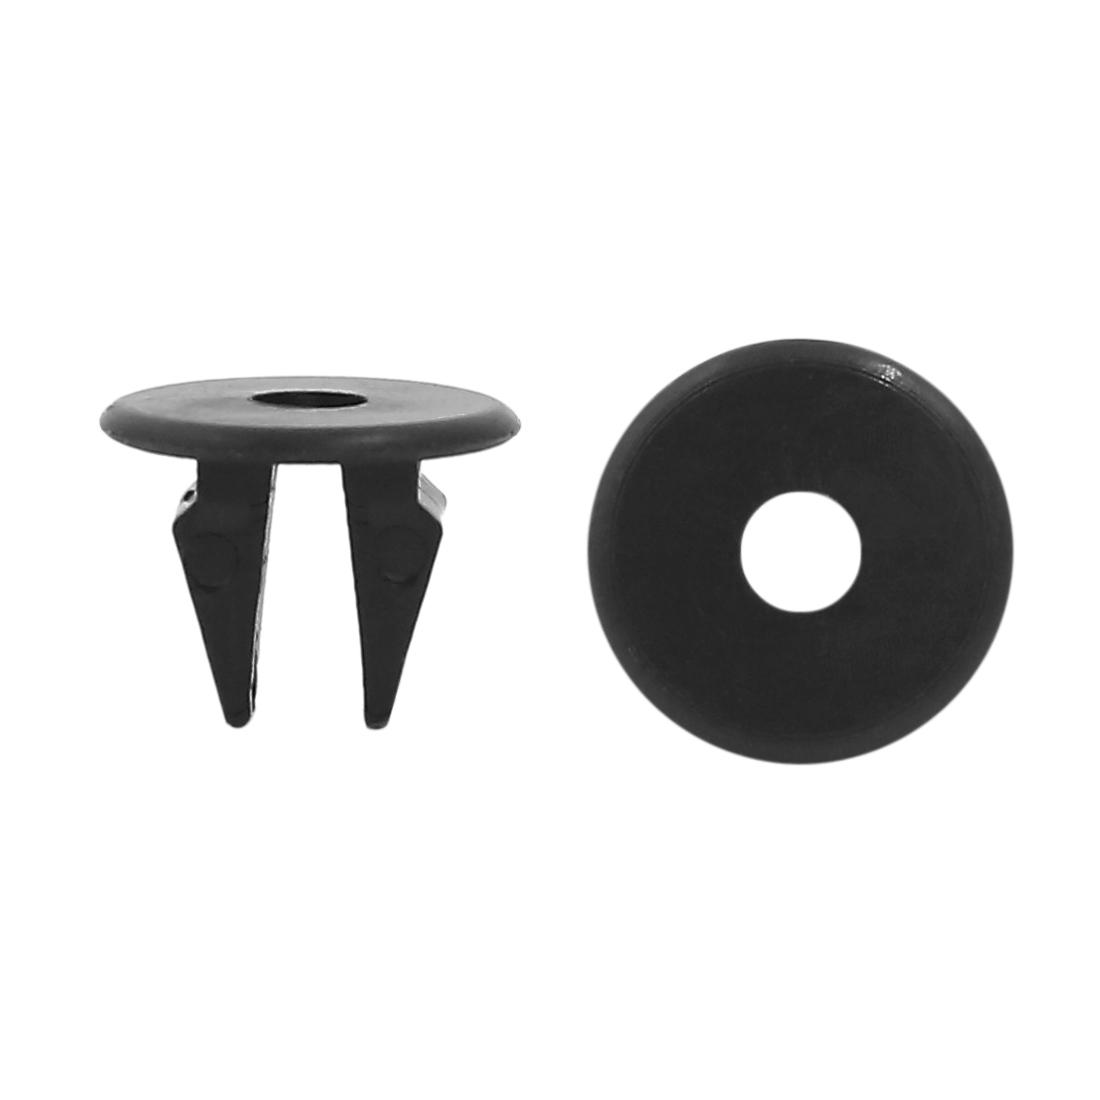 50Pcs 10mm Hole Dia Black Car Bumper Fender Square Plastic Rivets Retainer Clip